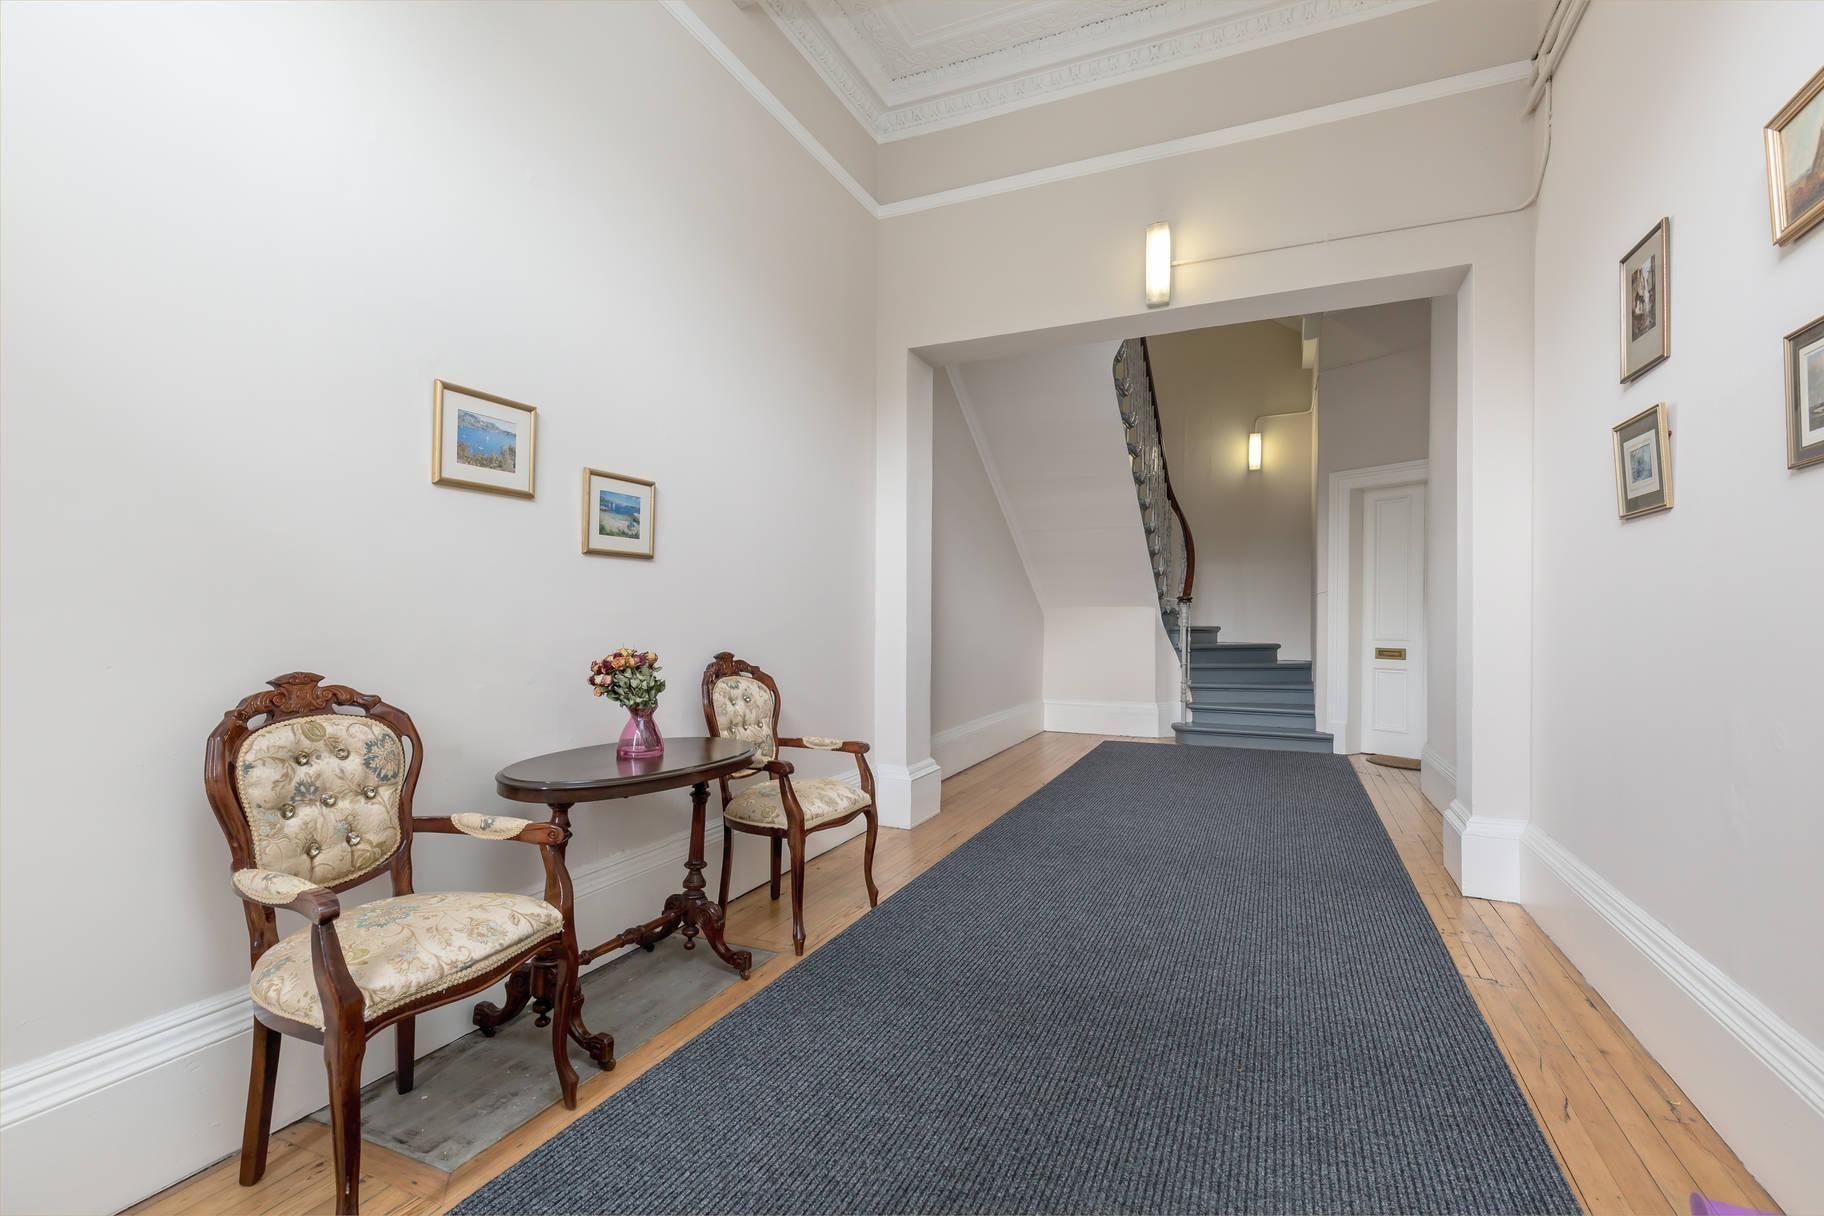 23/1 Buckingham Terrace, West End - Photo 10